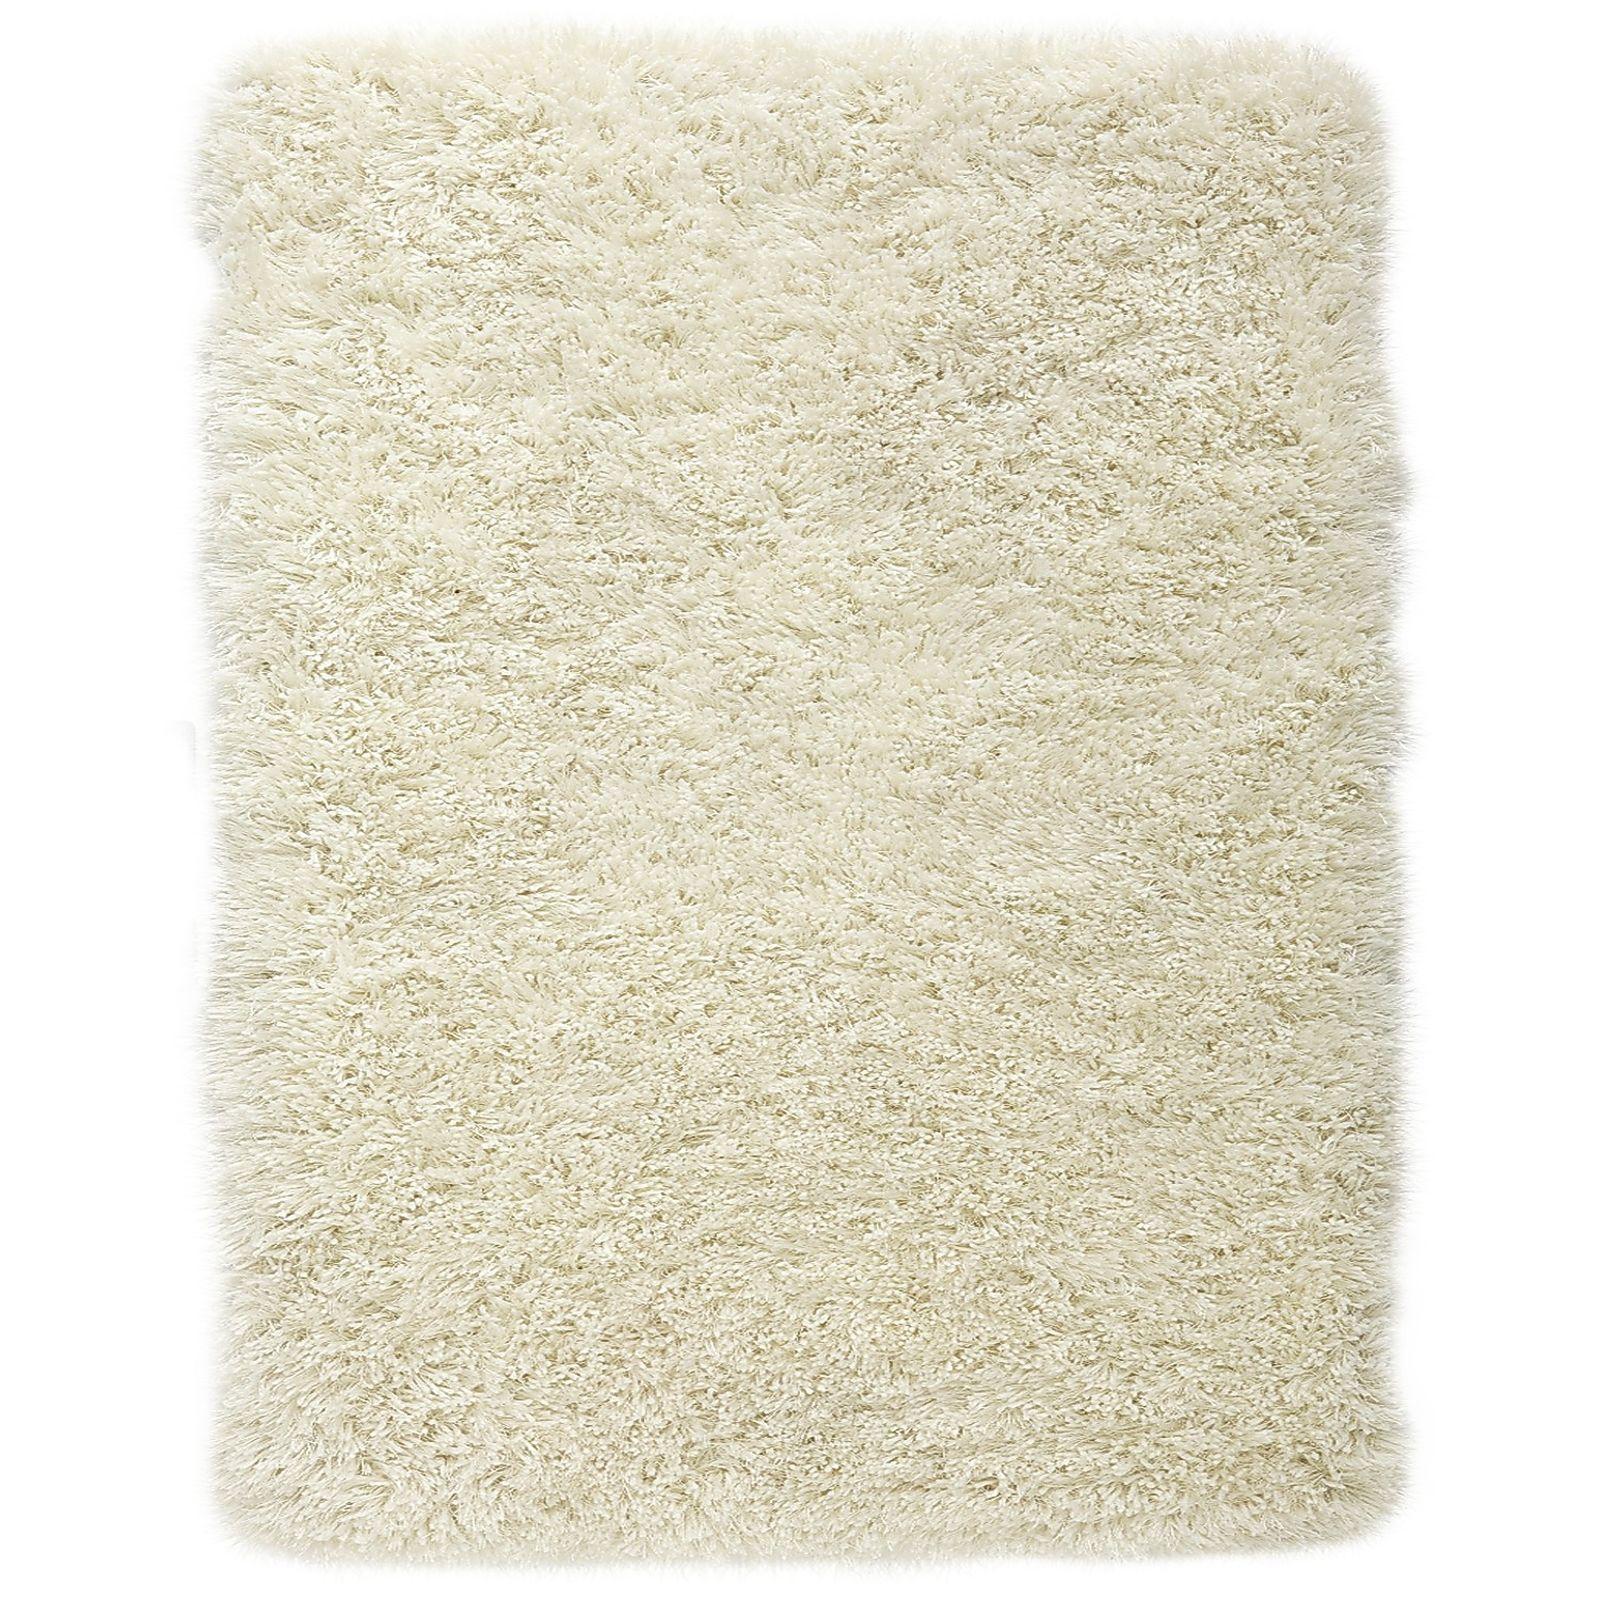 pier 1 living room rugs%0A Grand Ivory Shag Rug